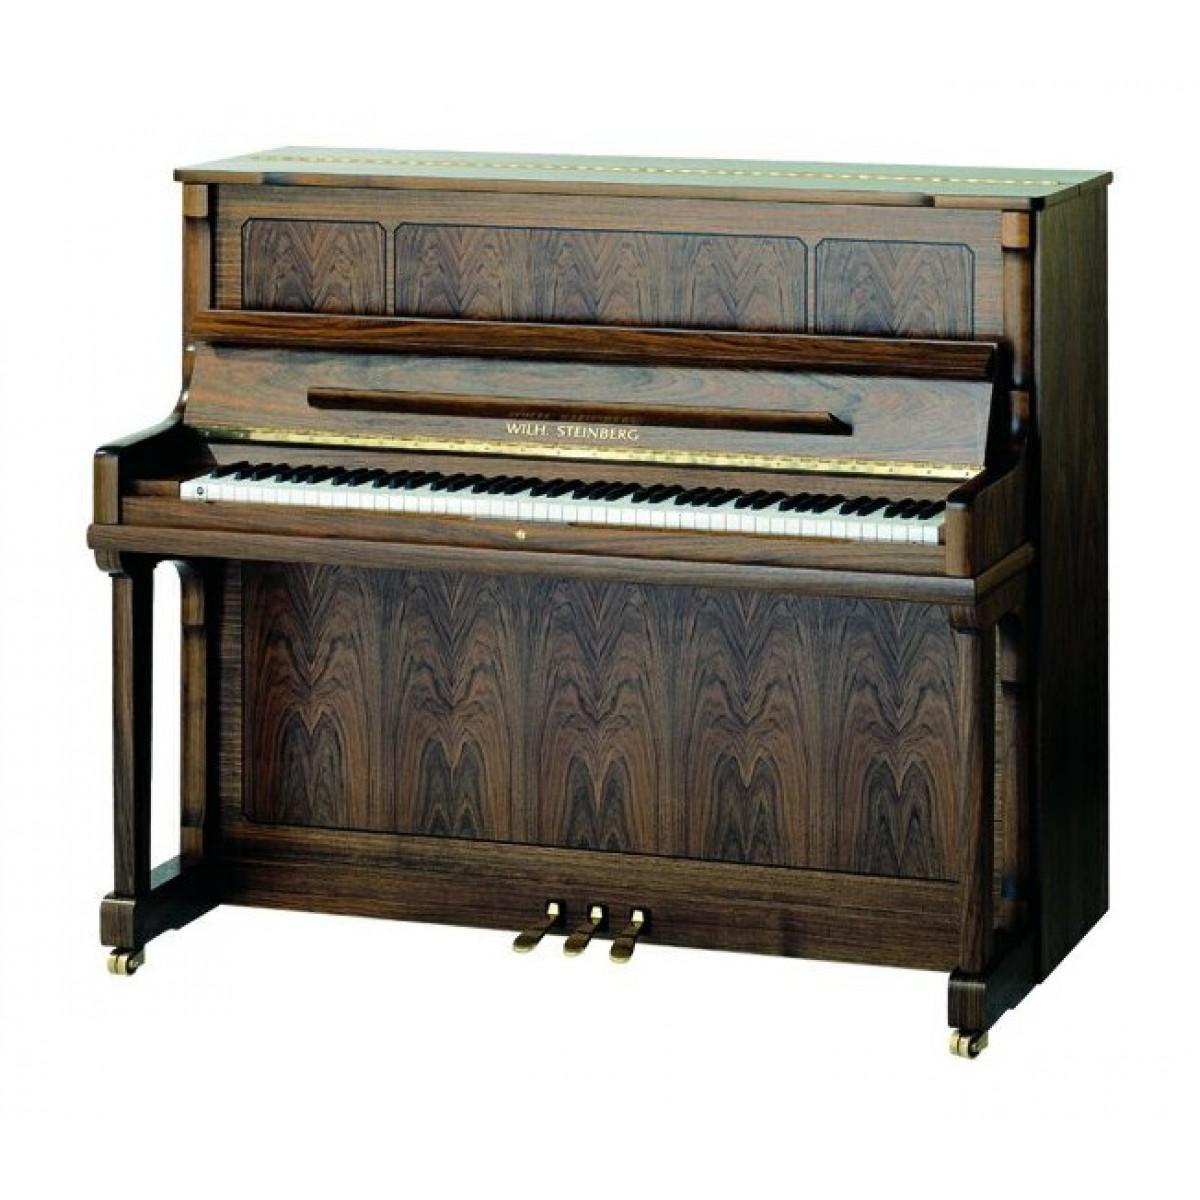 Neue Klaviere